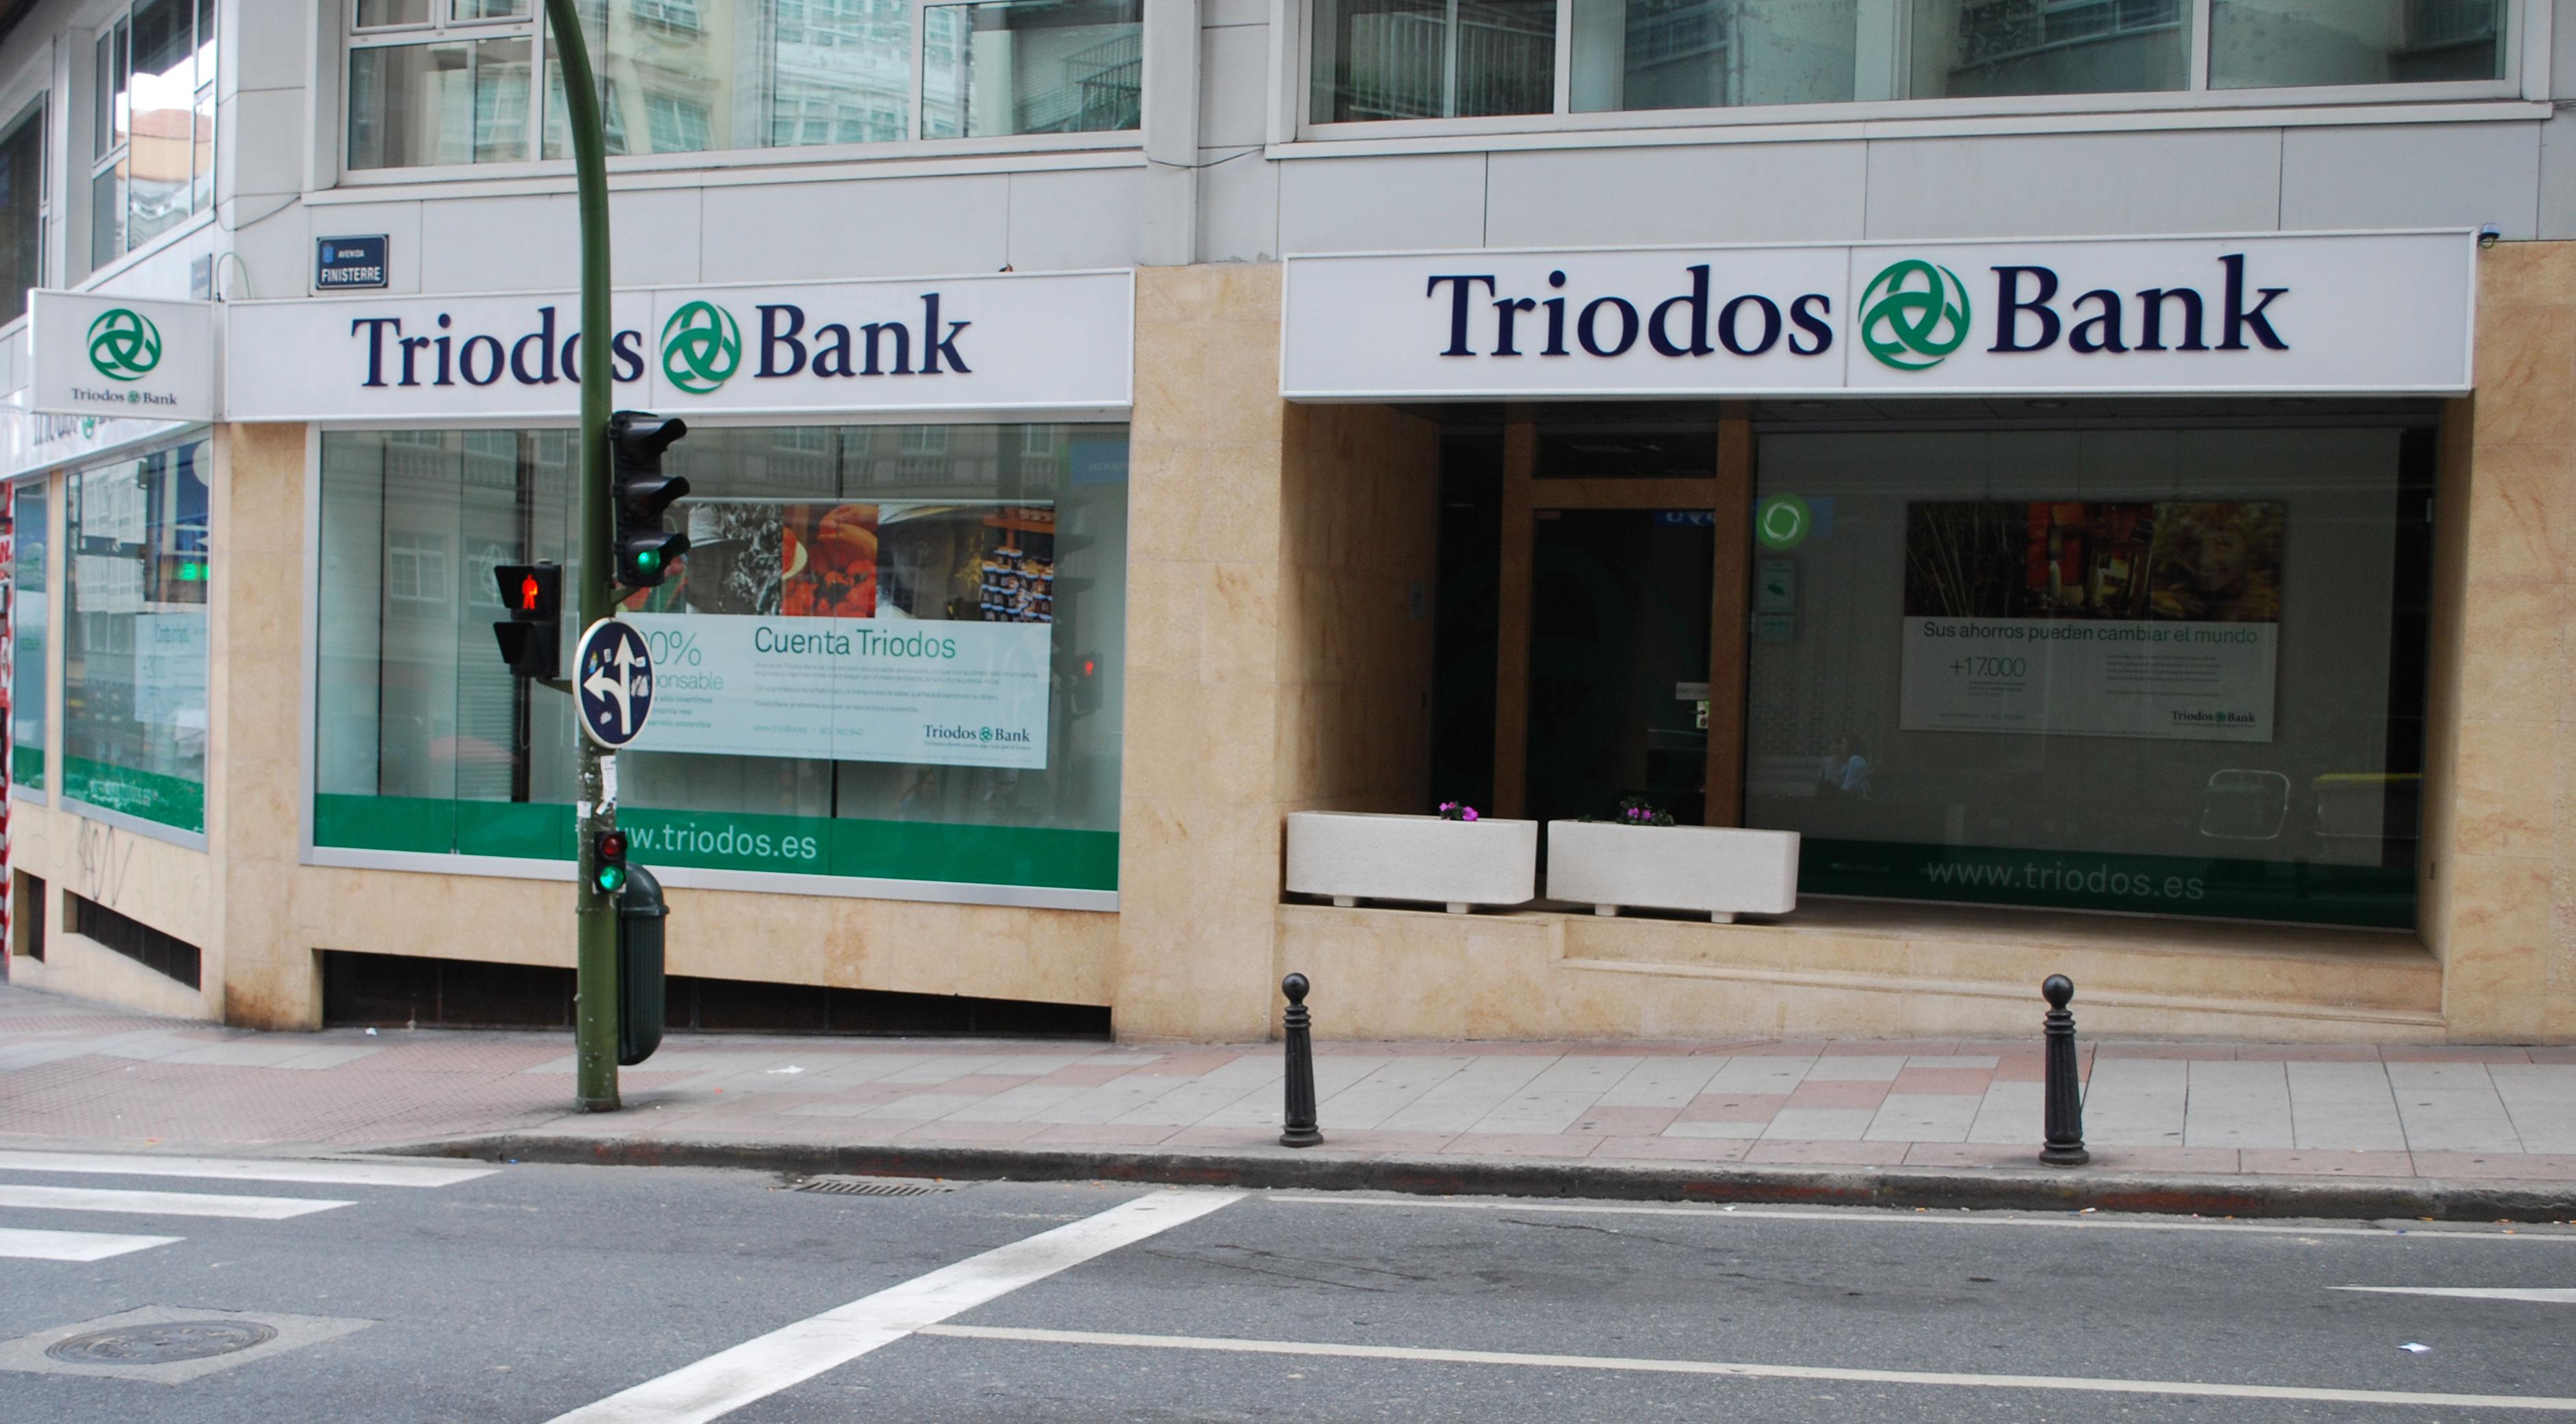 File oficina triodos bank a coru a galiza spain for Oficina triodos madrid